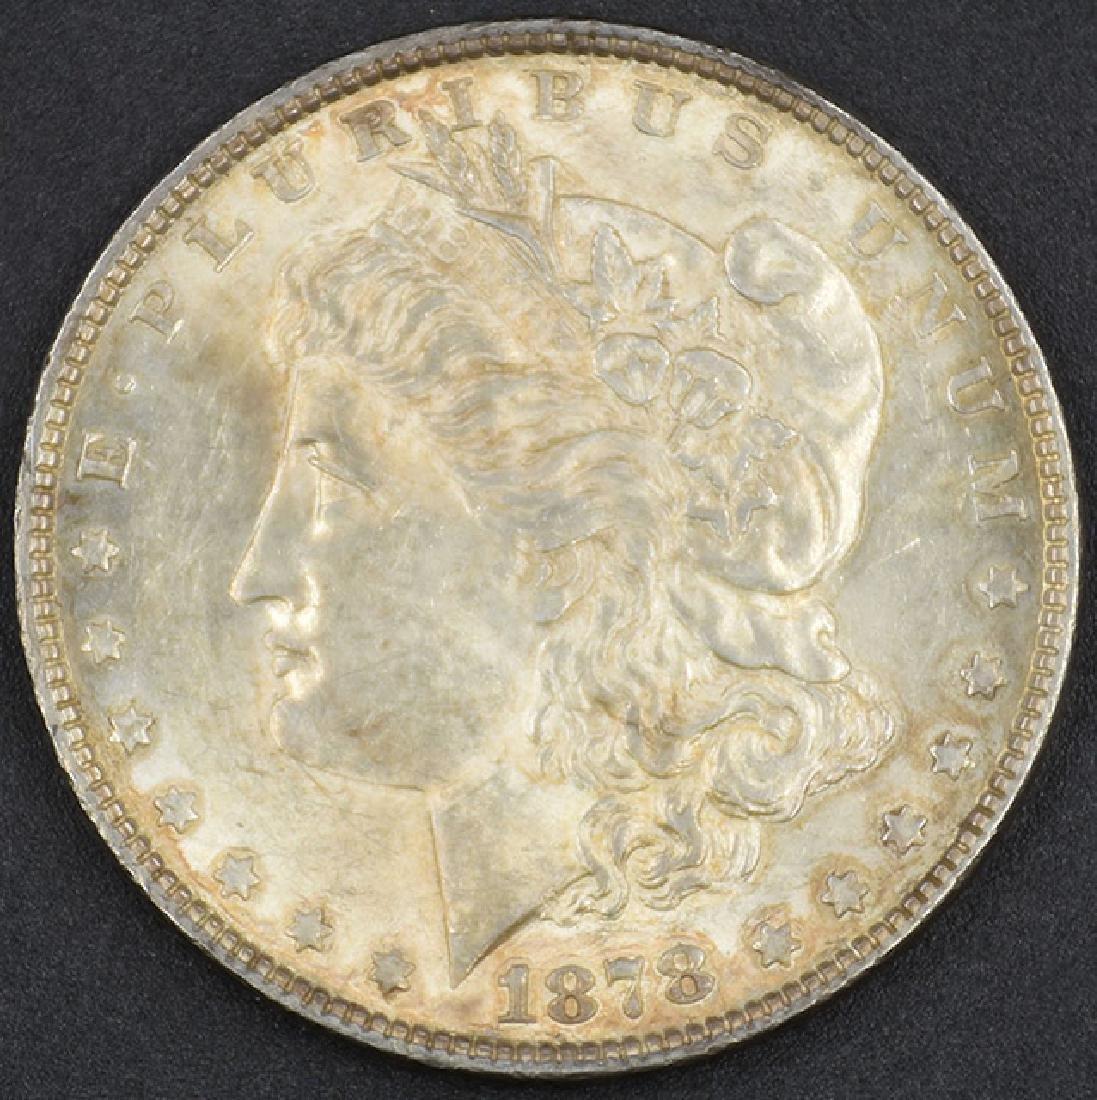 1878 7 TF Morgan Silver Dollar. Ungraded, Coin capsule